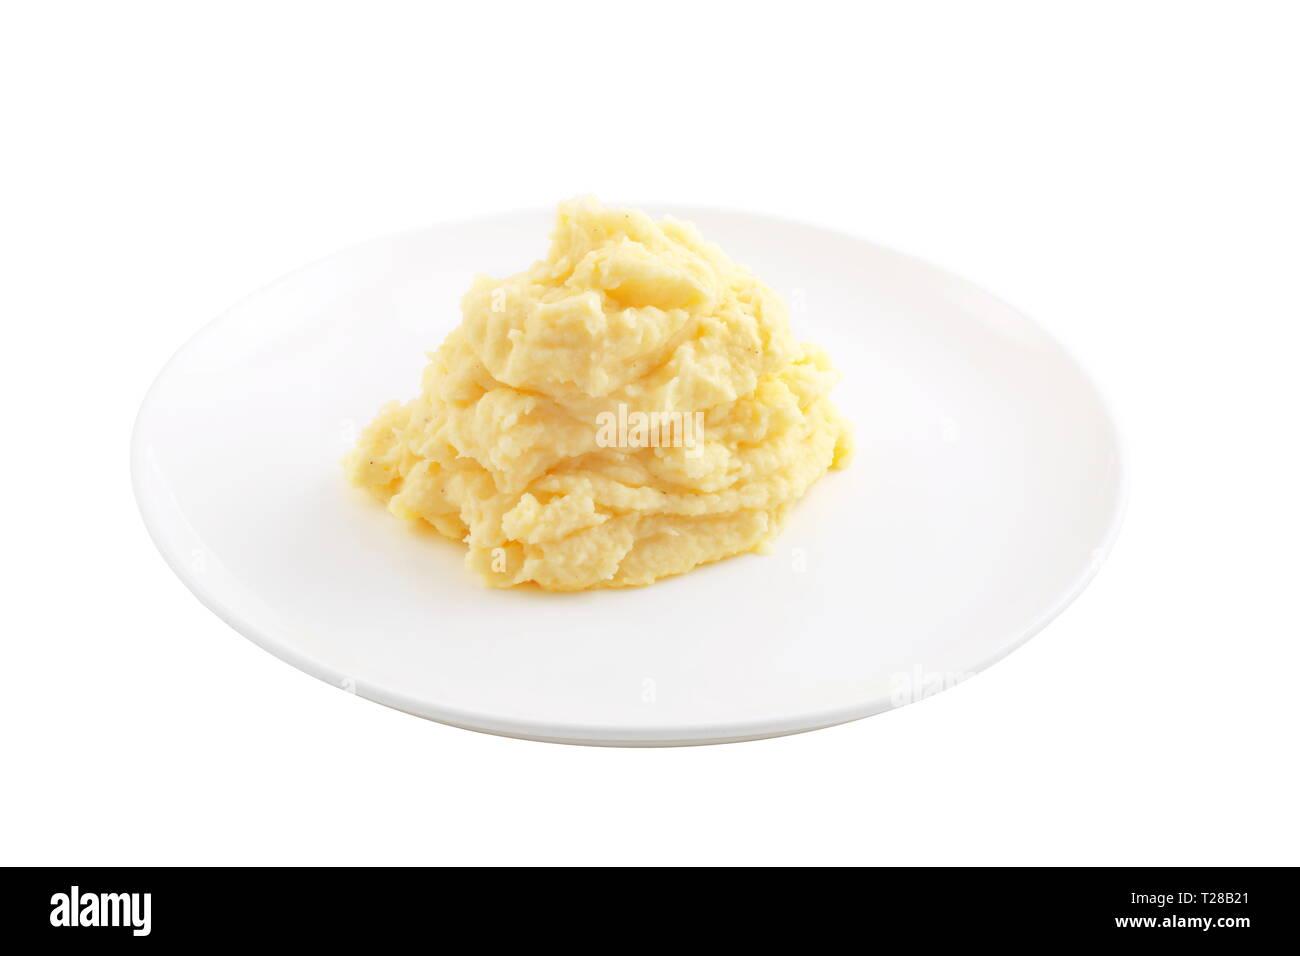 Mashed potatoes on a white background - Stock Image